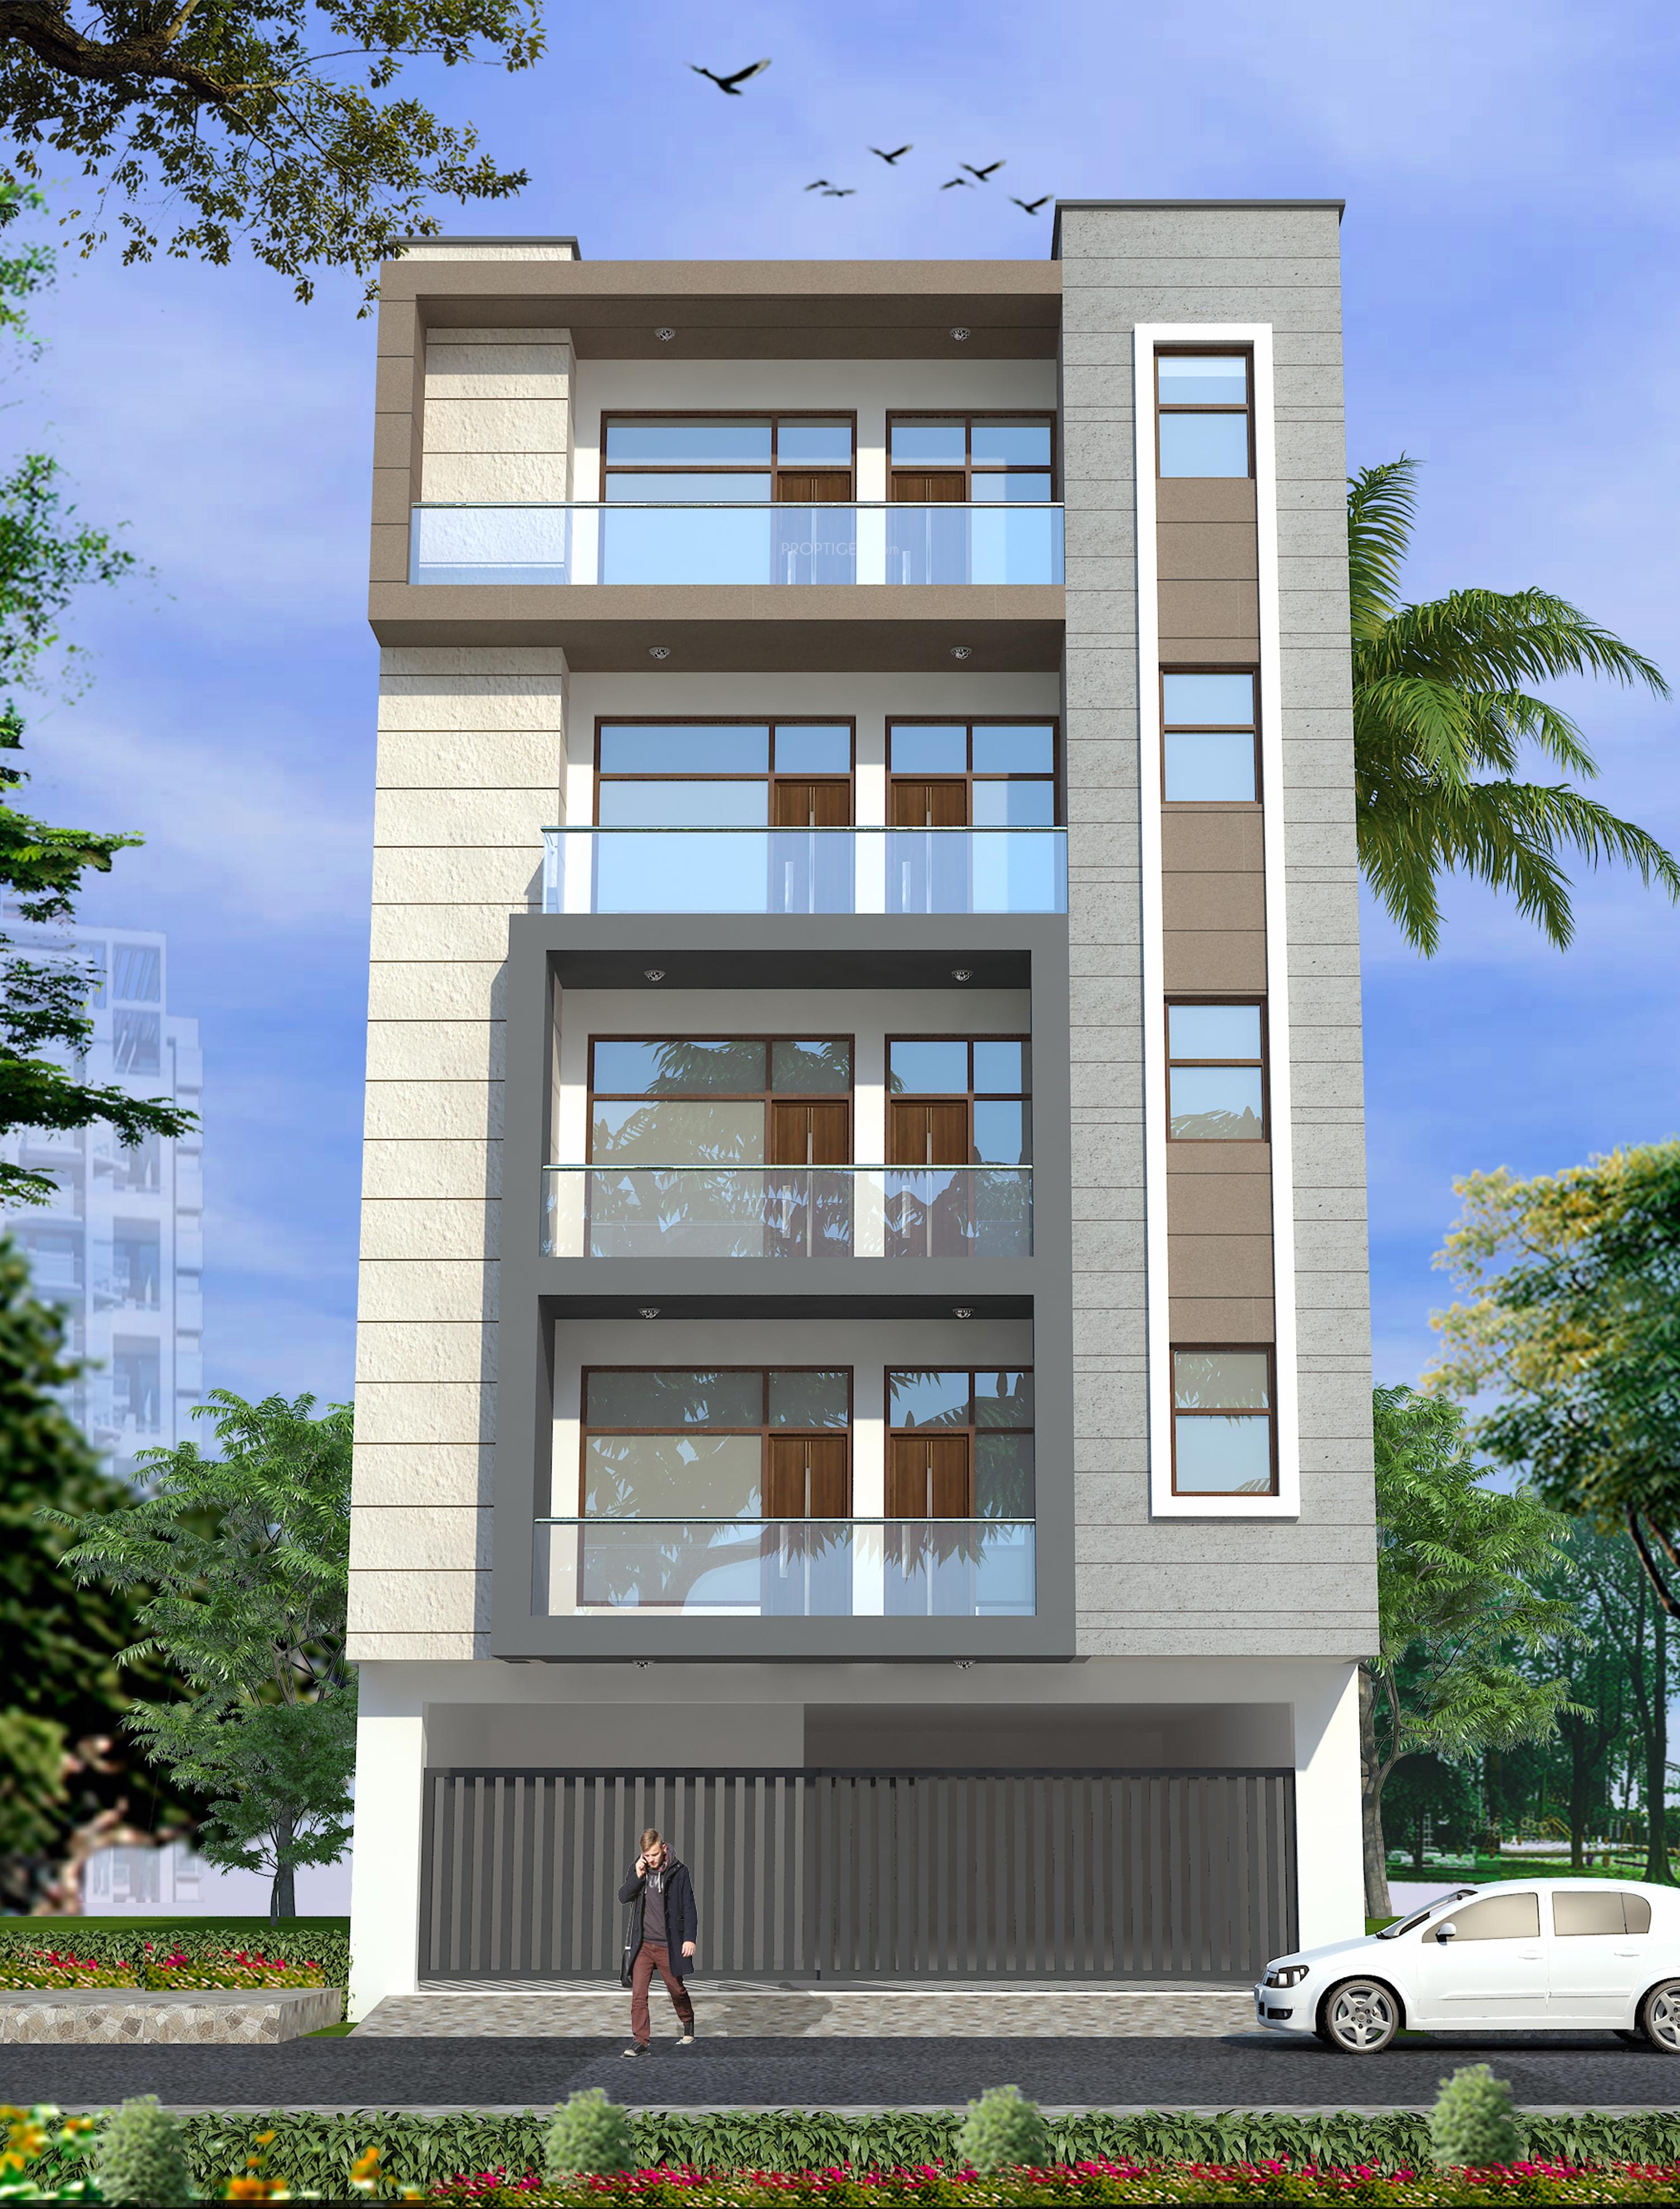 Home Design Ideas Elevation: CS Aravali Tower In Mandi, Delhi